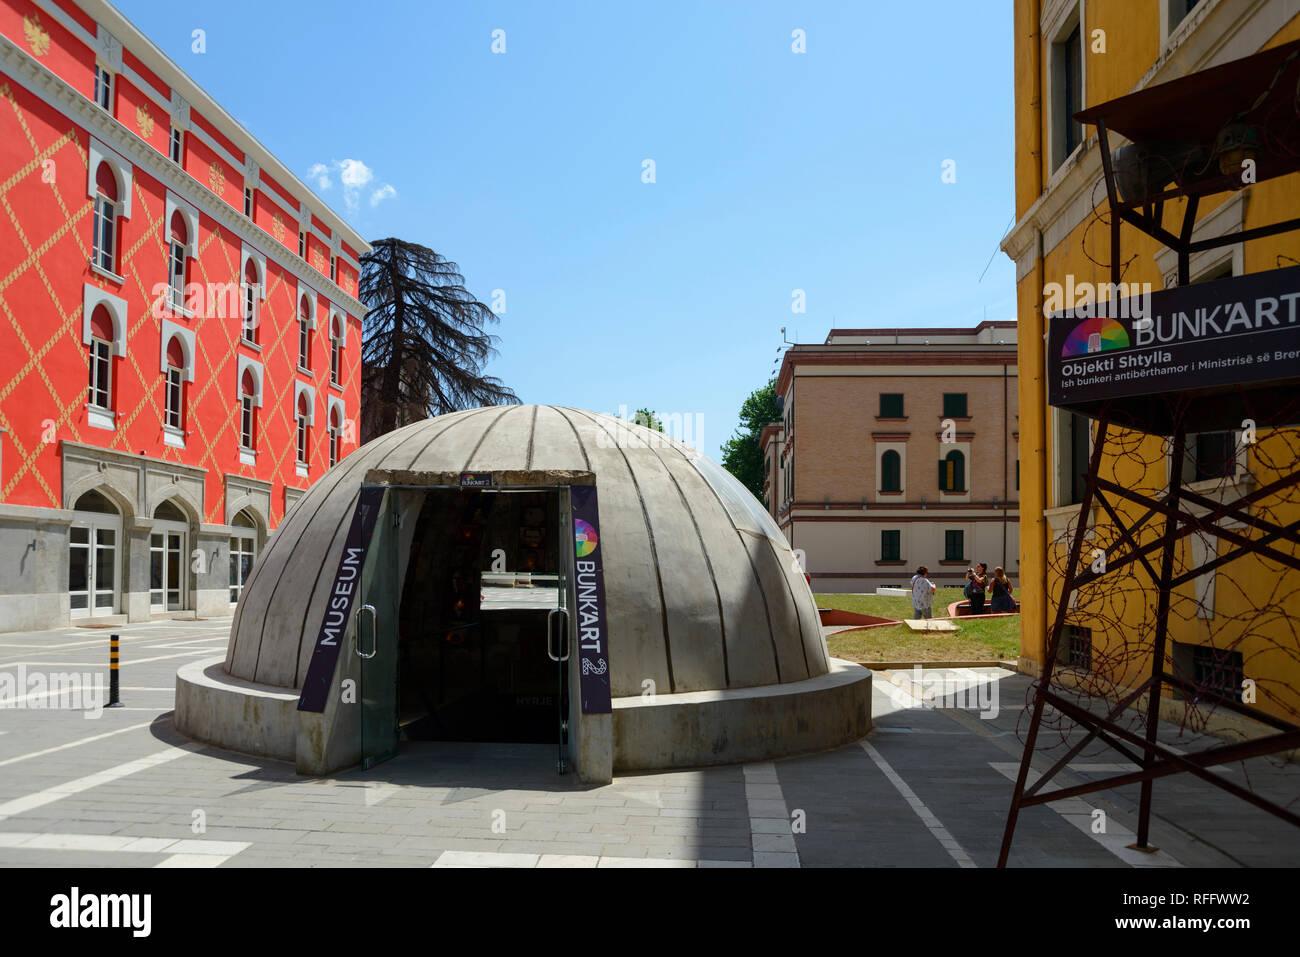 Old bunker, Entrance to Museum Bunk'Art 2, City Centre, Tirana, Albania - Stock Image